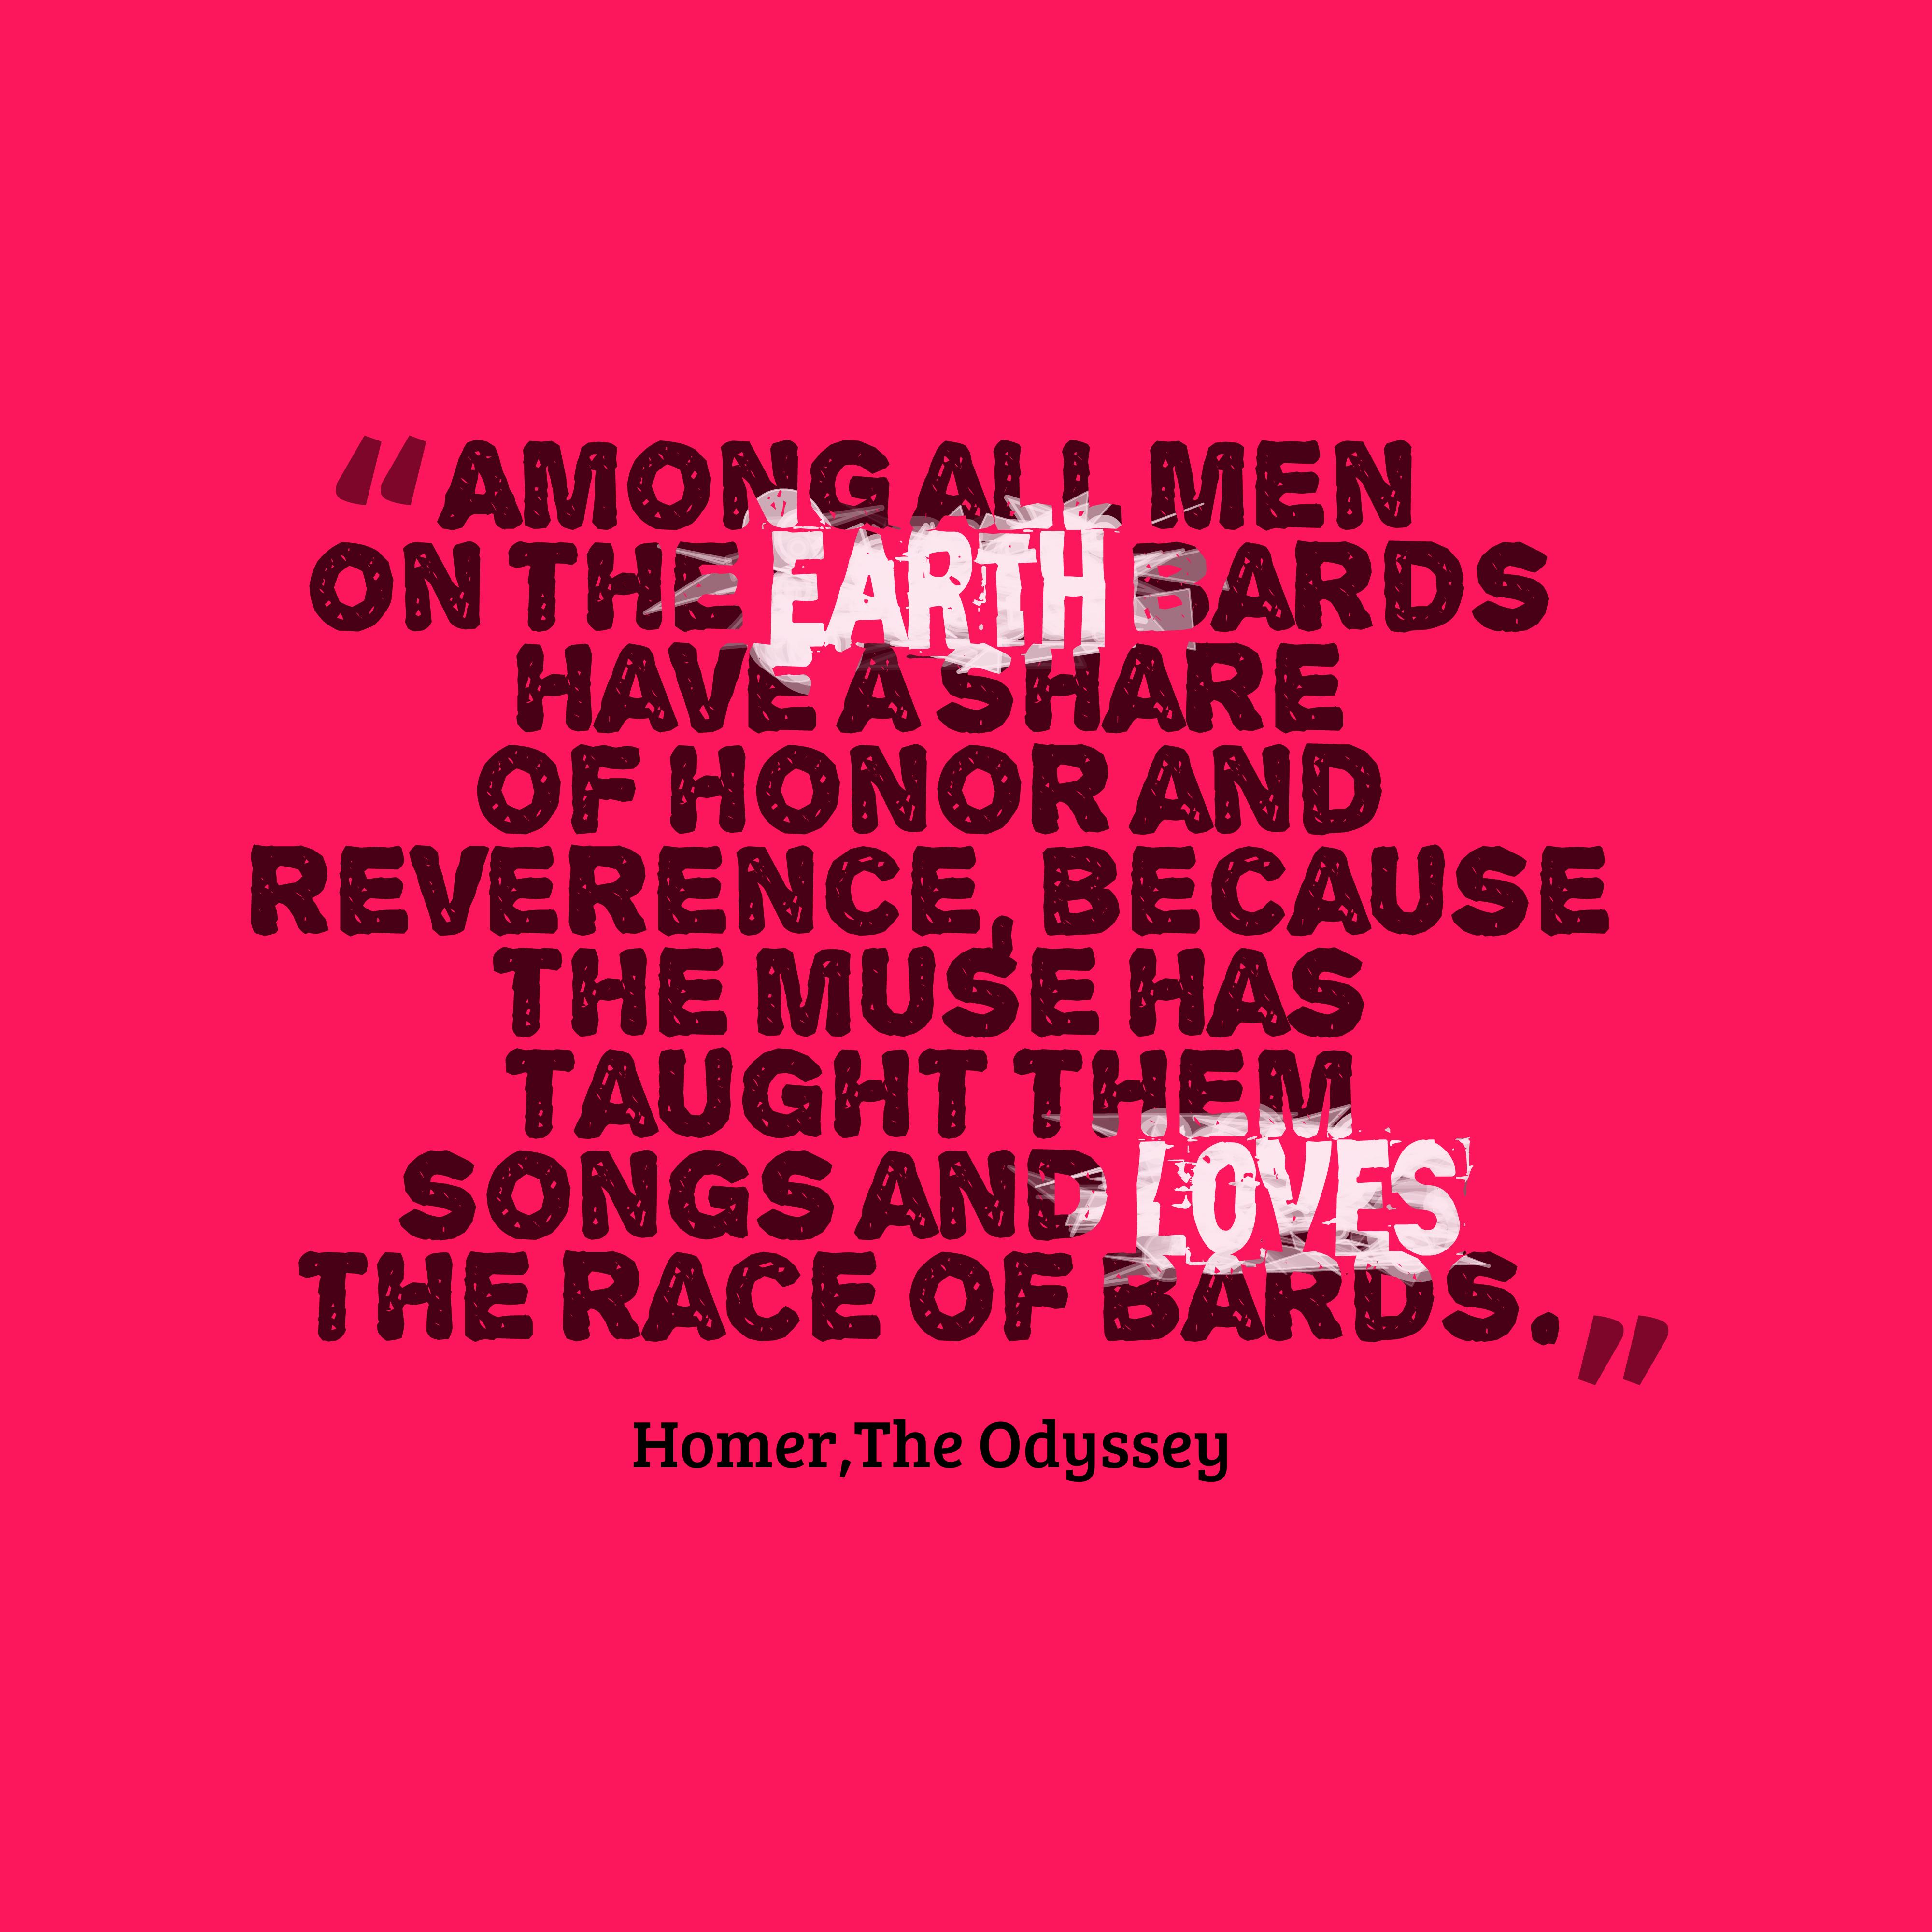 Homer Love Quotes Odyssey - Valentine Day